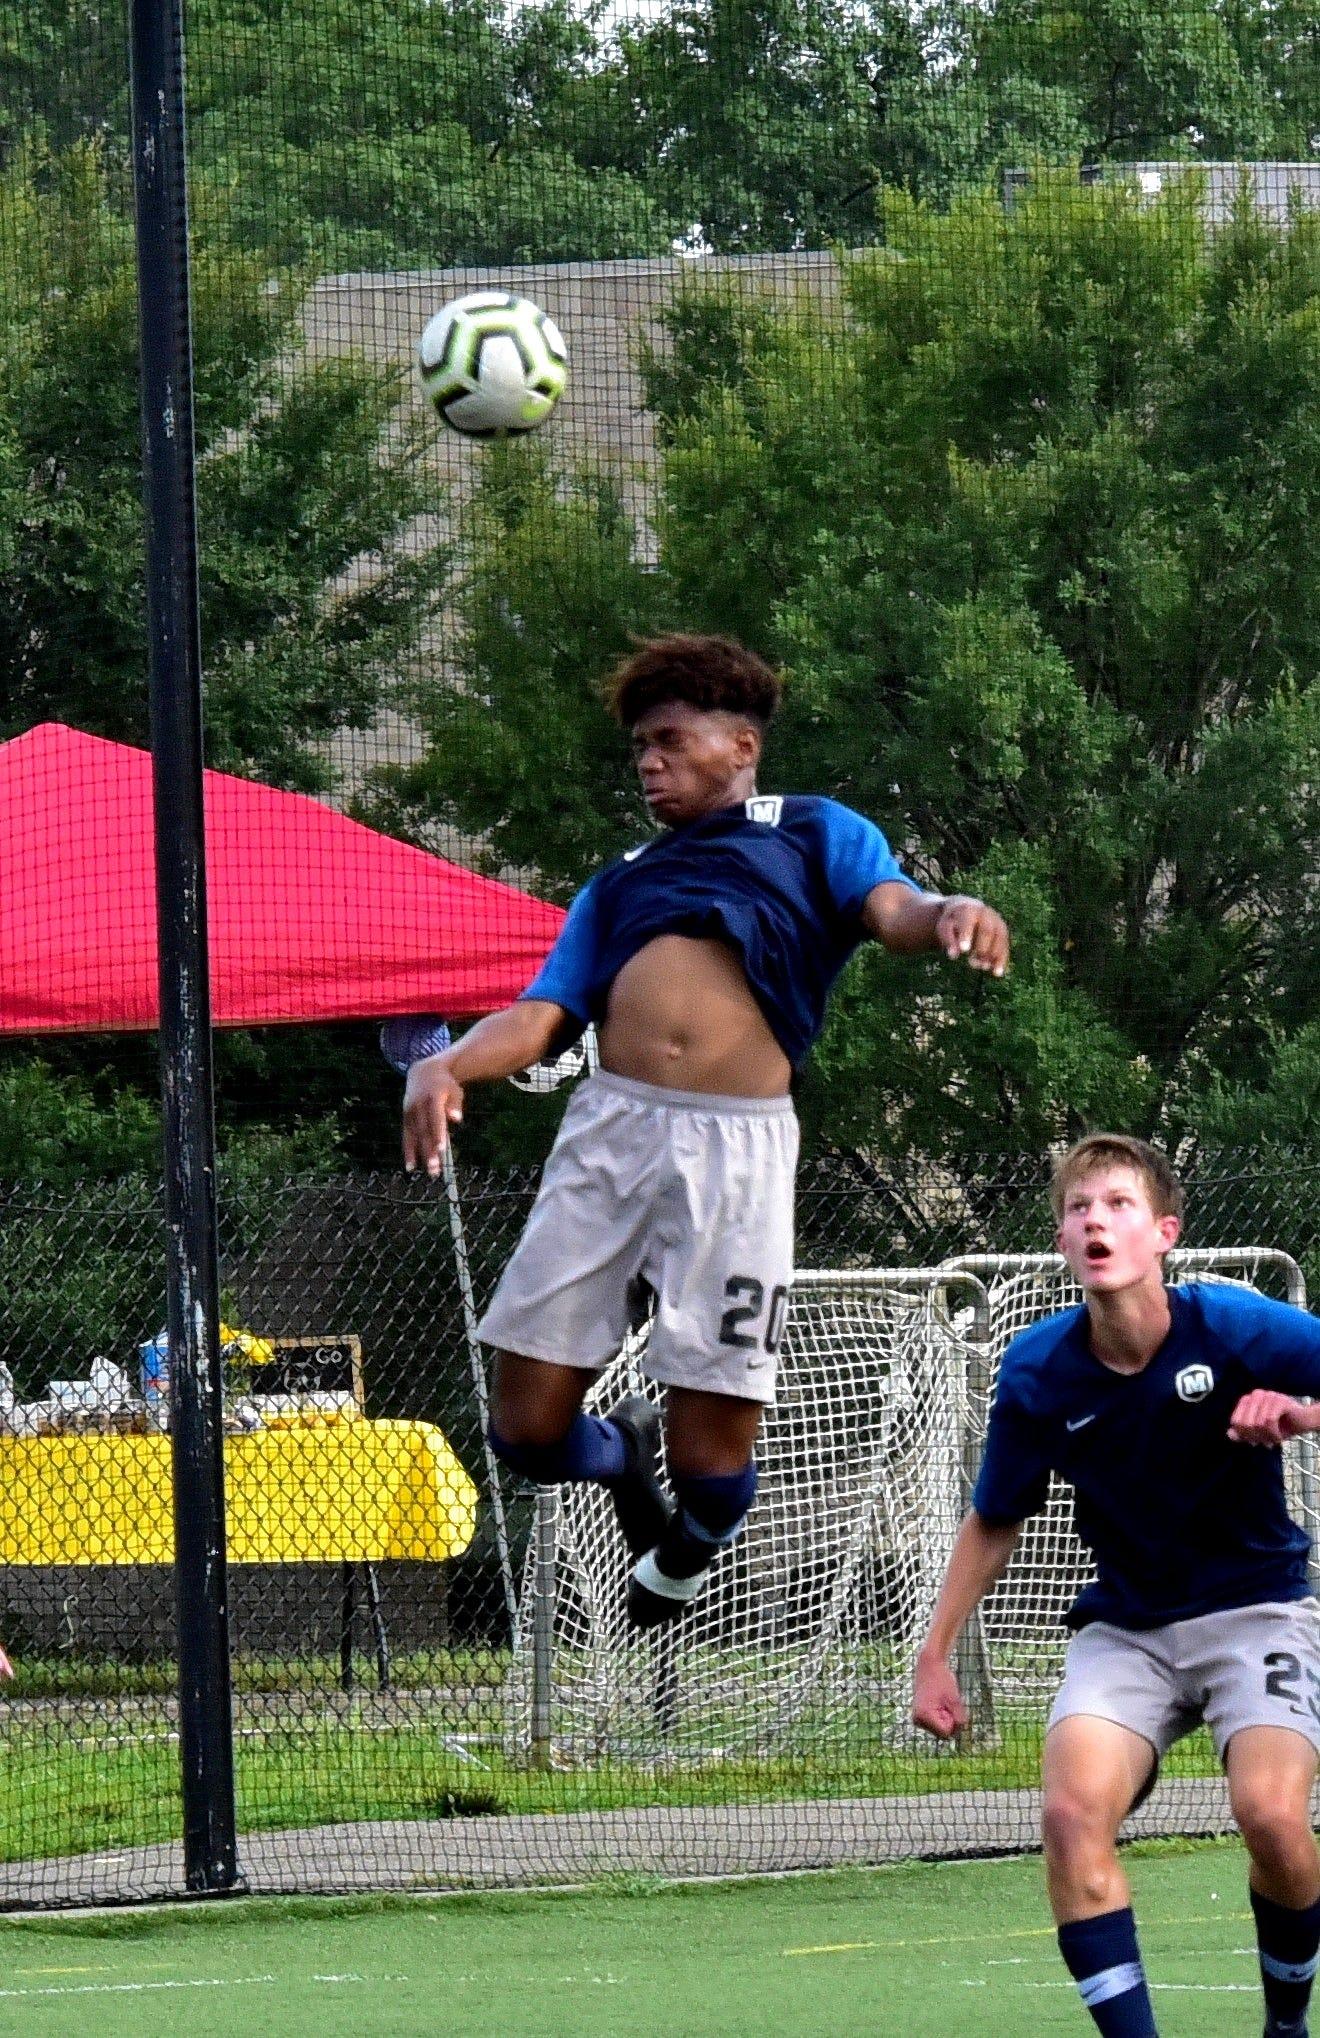 PHOTOS: Moeller boys soccer 1, Loveland 0, Aug. 17